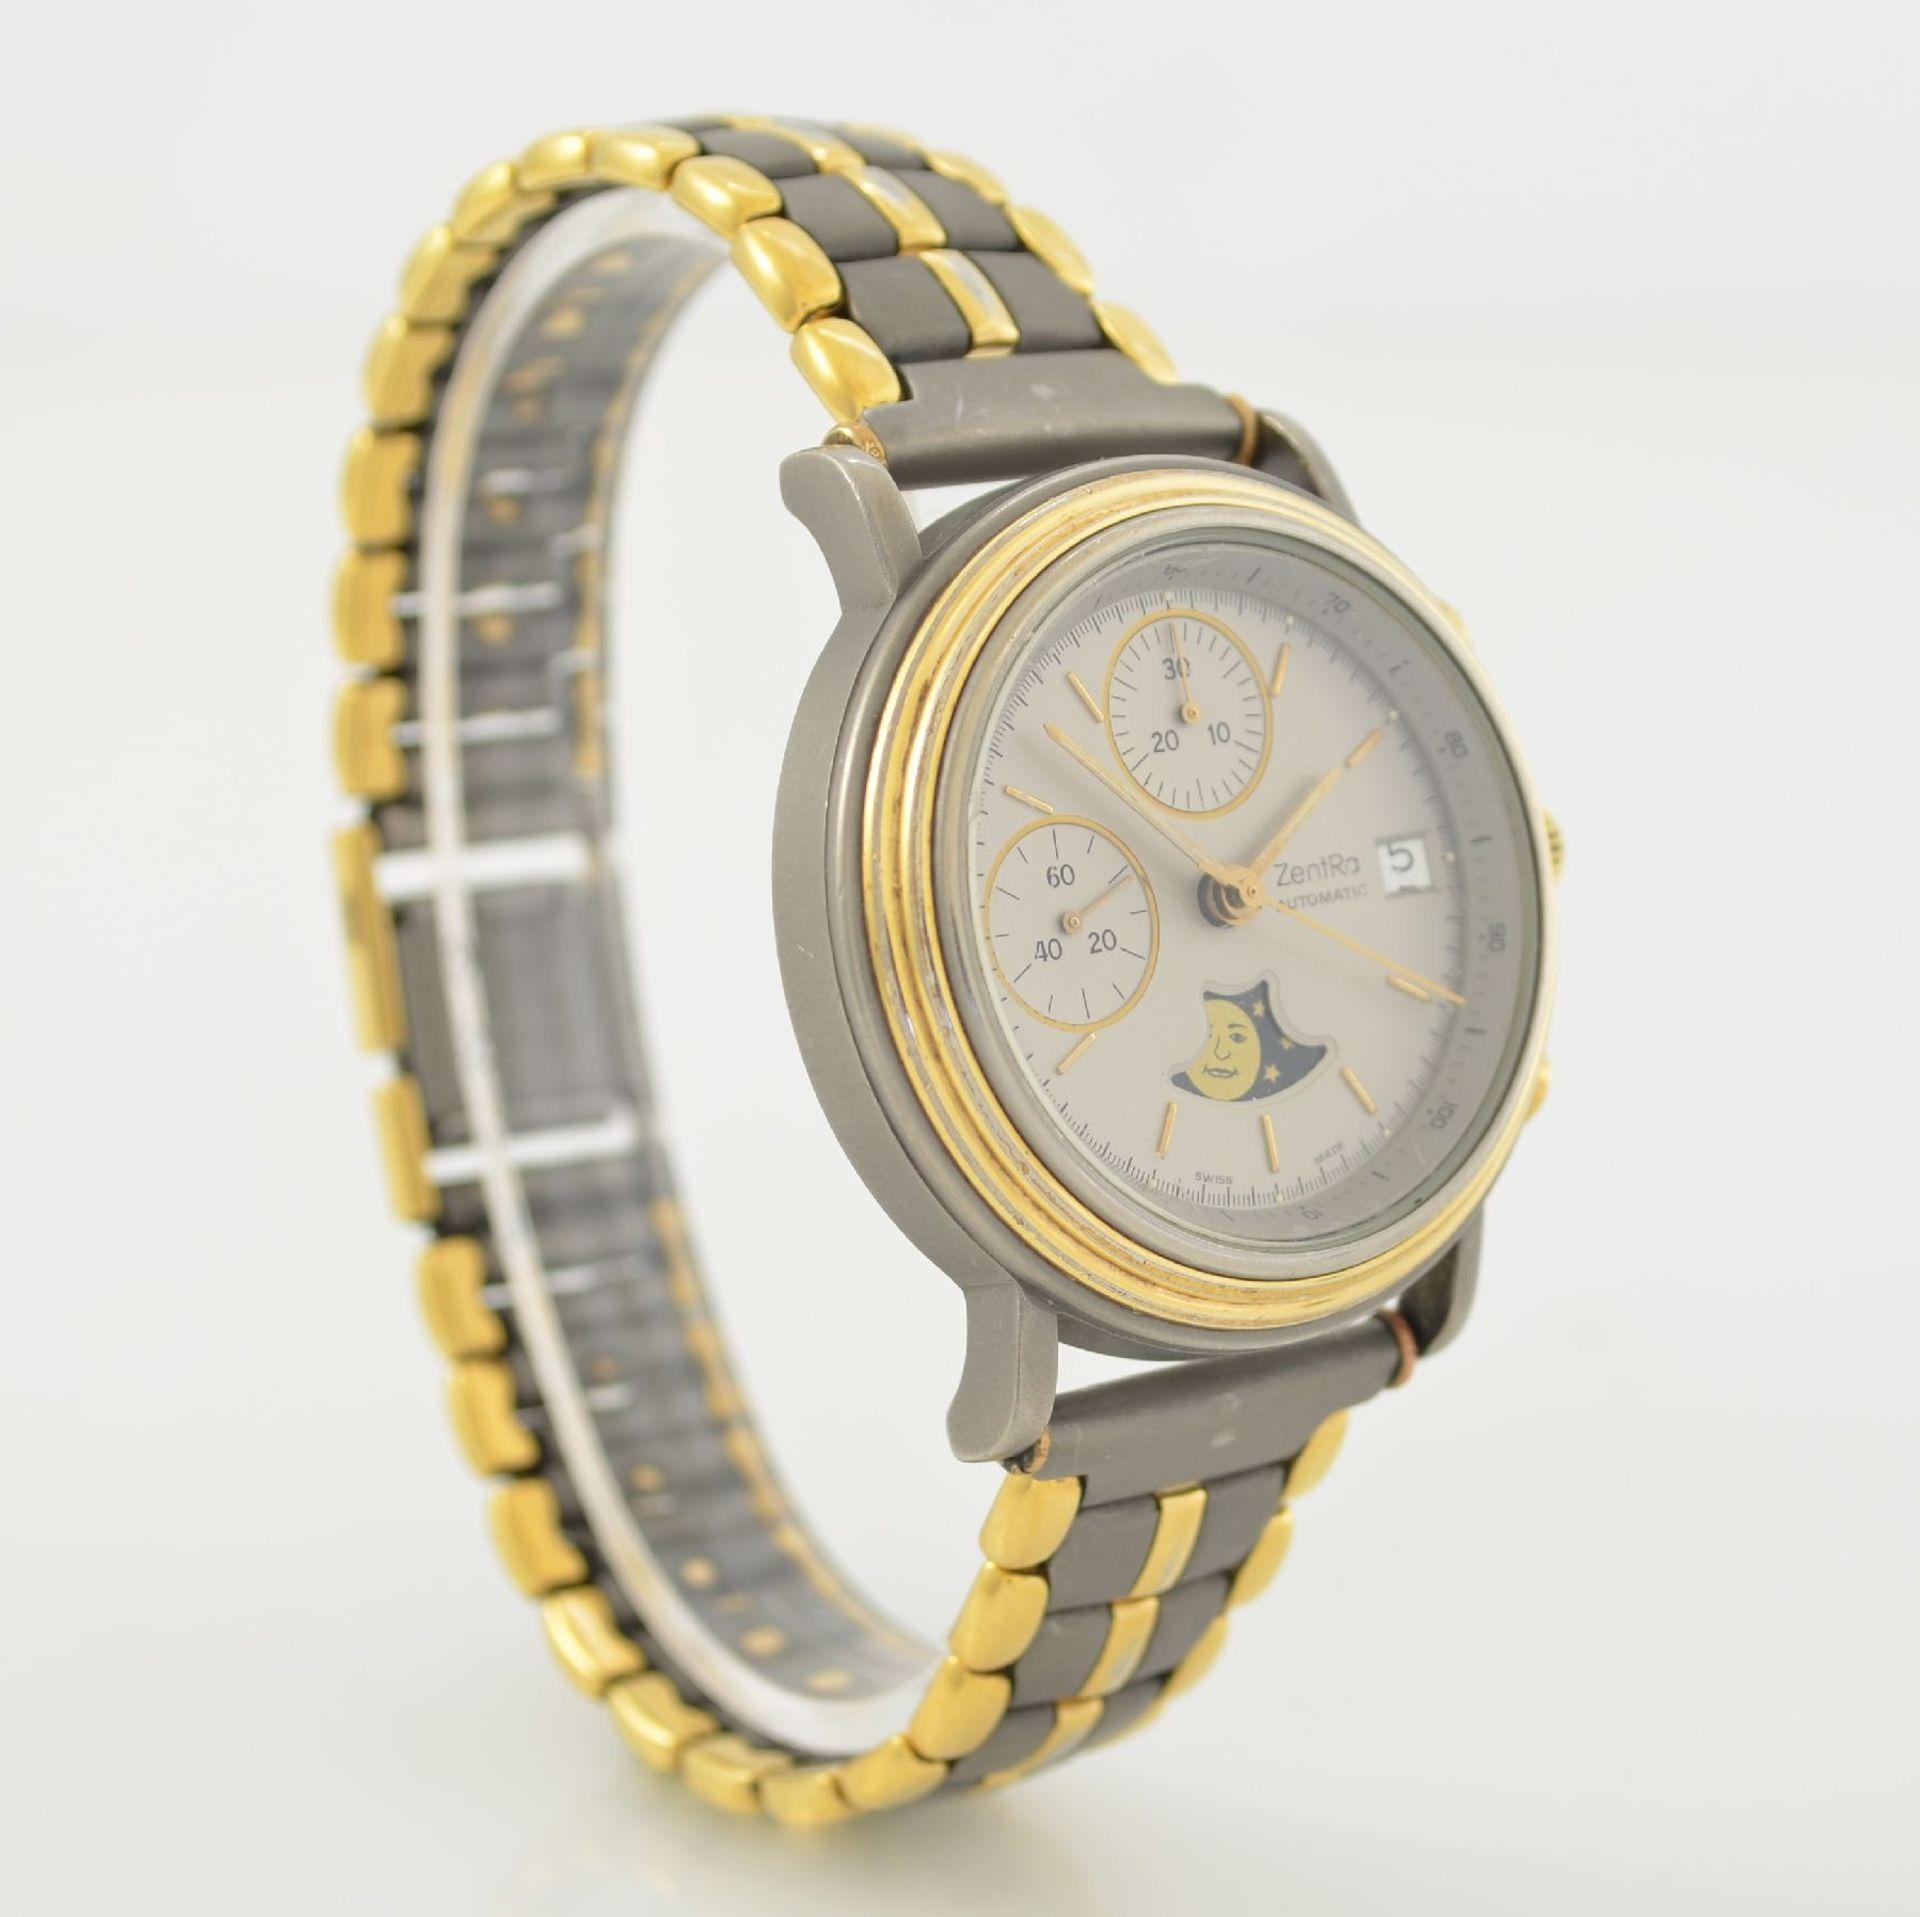 ZENTRA Herrenarmbanduhr Armbandchronograph, Automatik, Schweiz um 1987, Titangeh. inkl. - Bild 4 aus 6